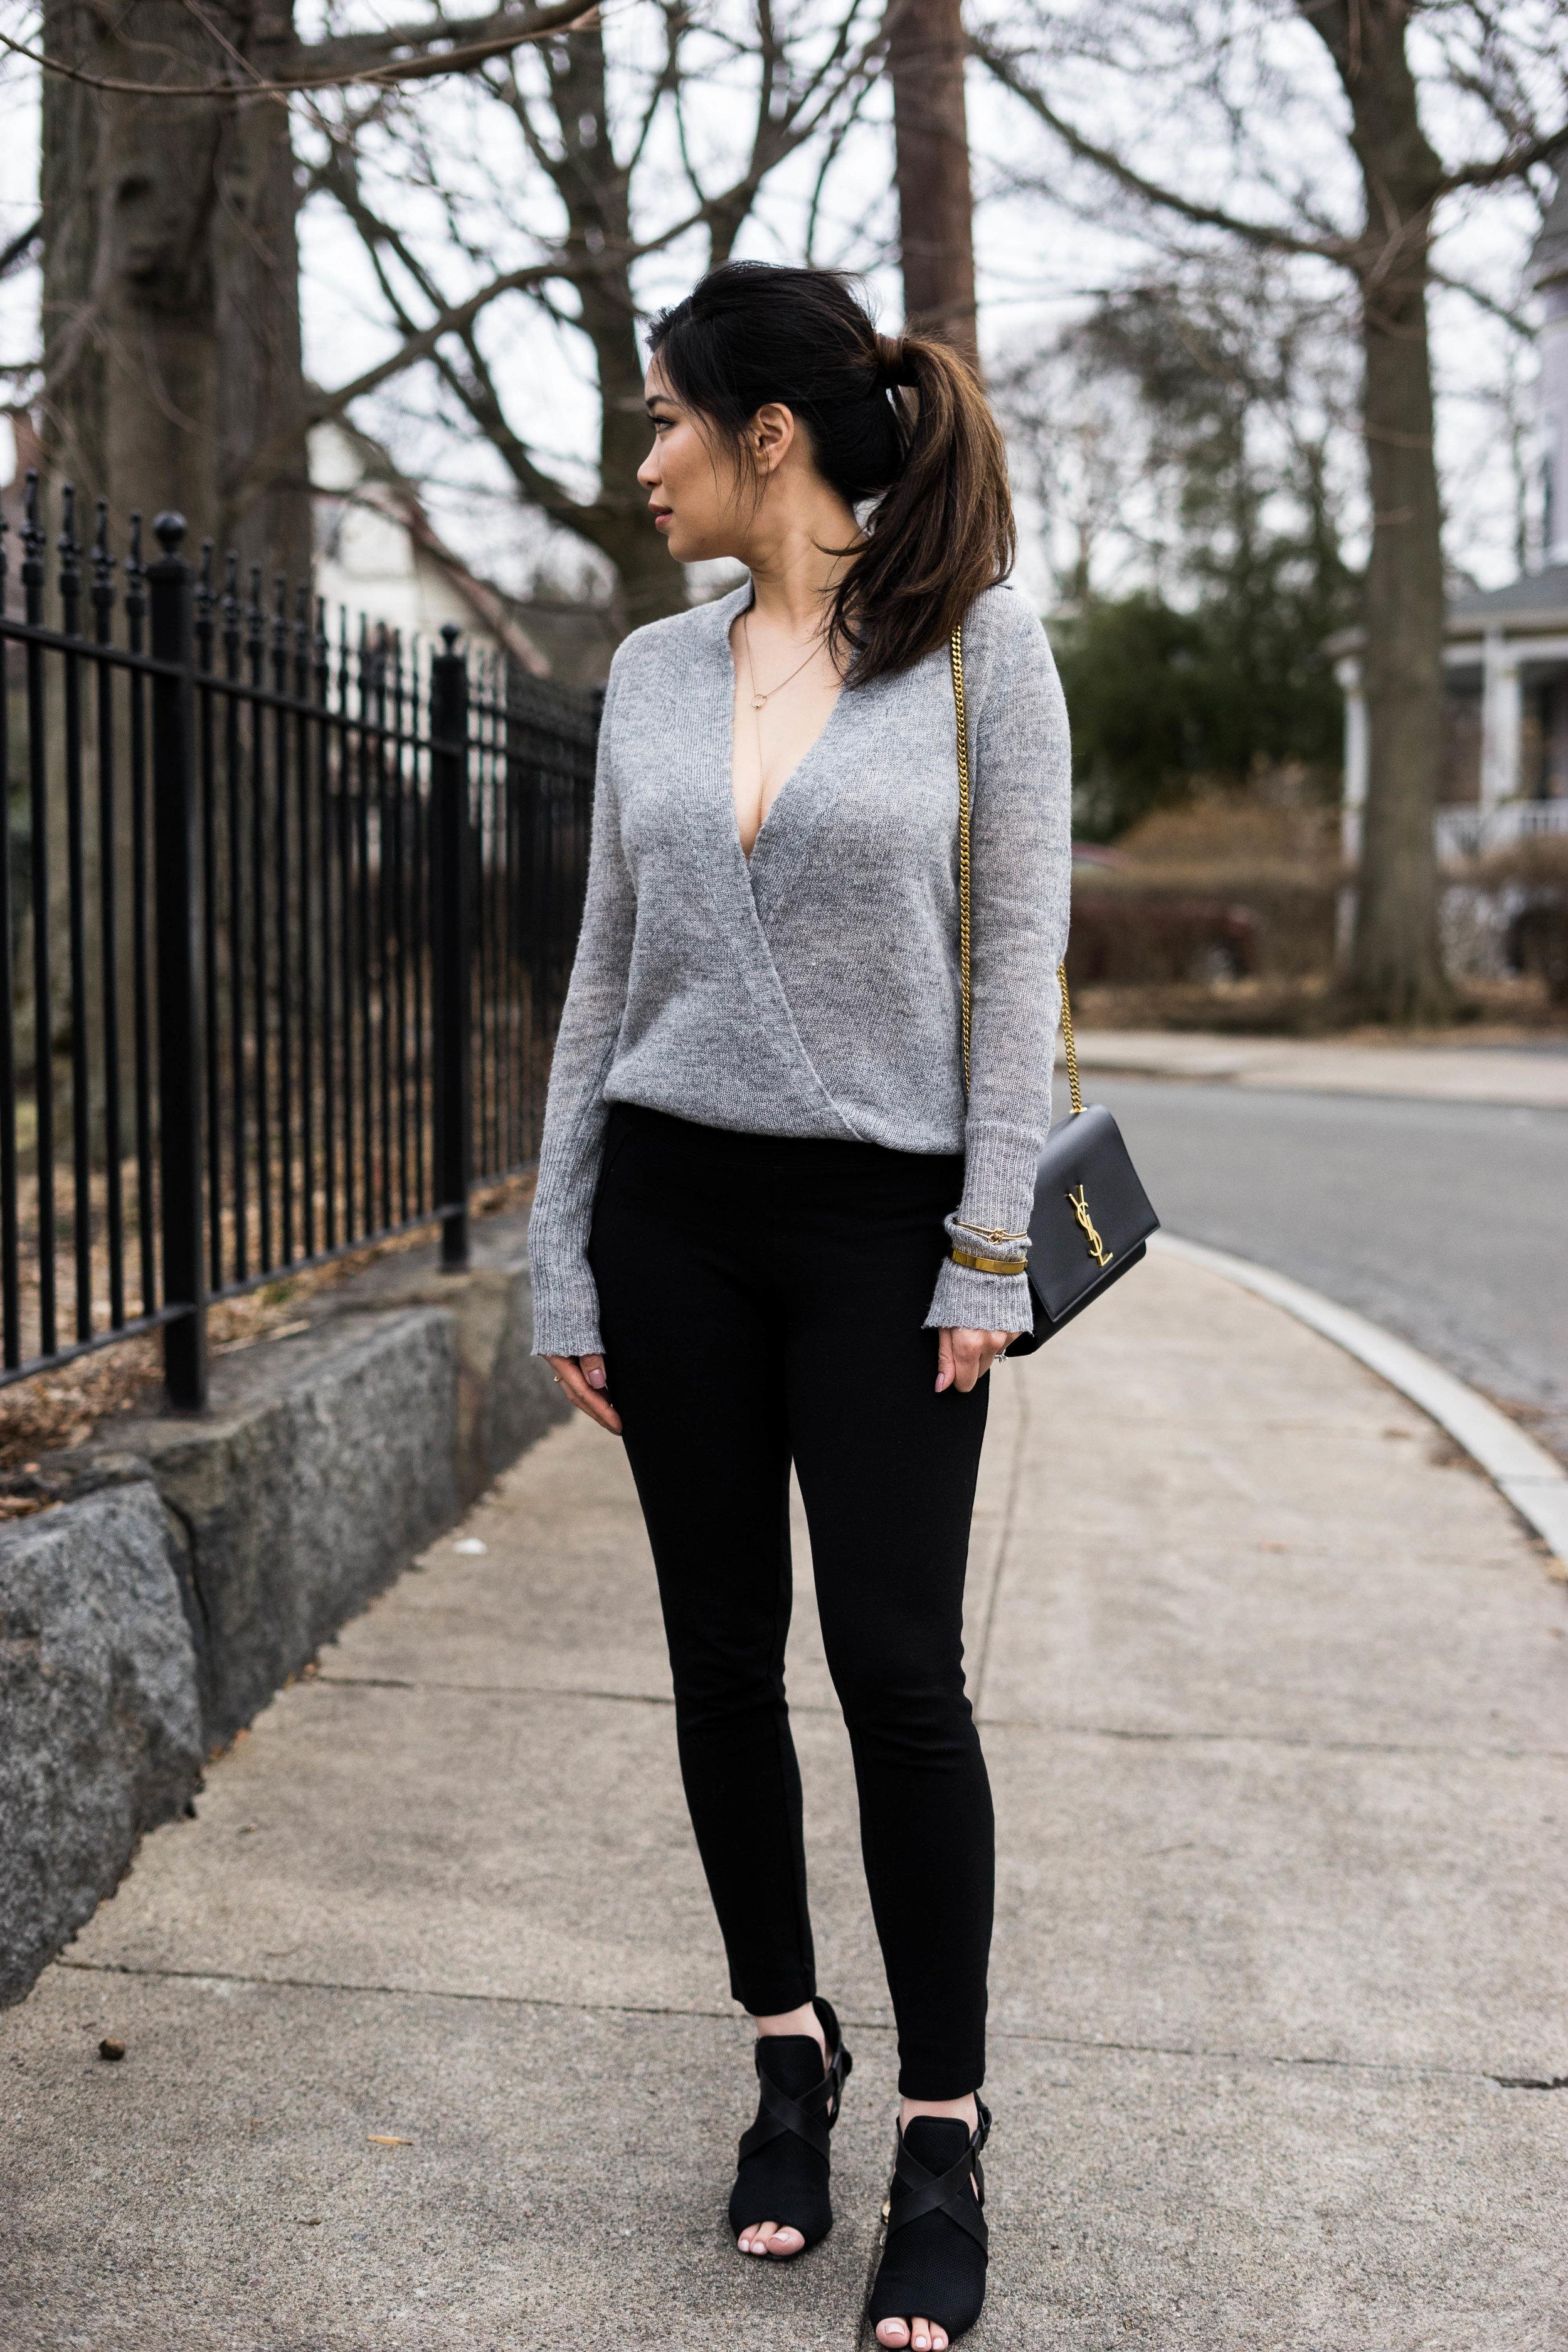 Lulu's Wrap Sweater & Brass Ponte Pants - TheNinesBlog.com: A Boston Blog